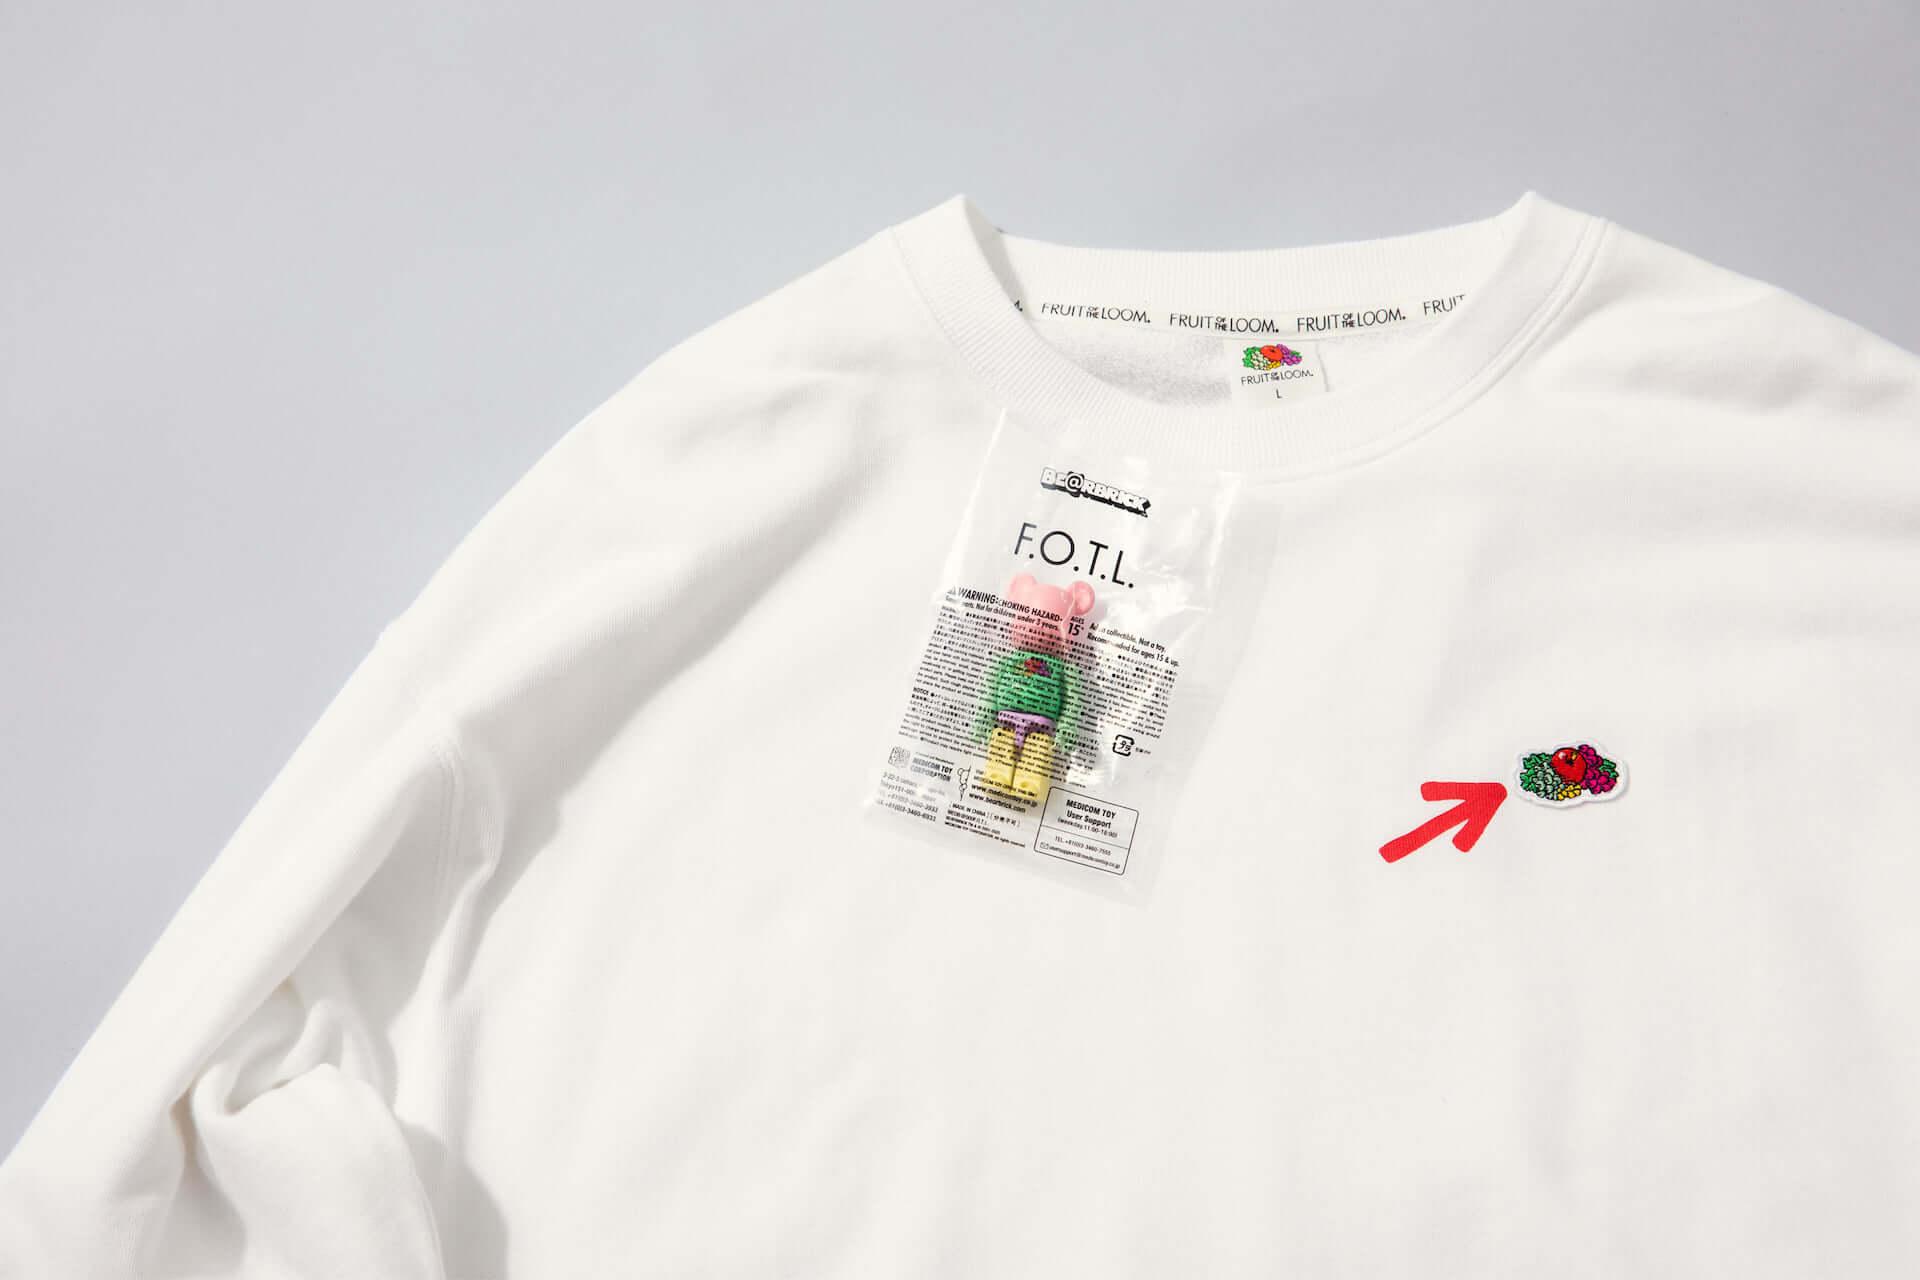 FRUIT OF THE LOOMから限定スウェットシャツが販売決定!フルーツカラーの『BE@RBRICK』も付属 lf200907_fruitoftheloom_2-1920x1280